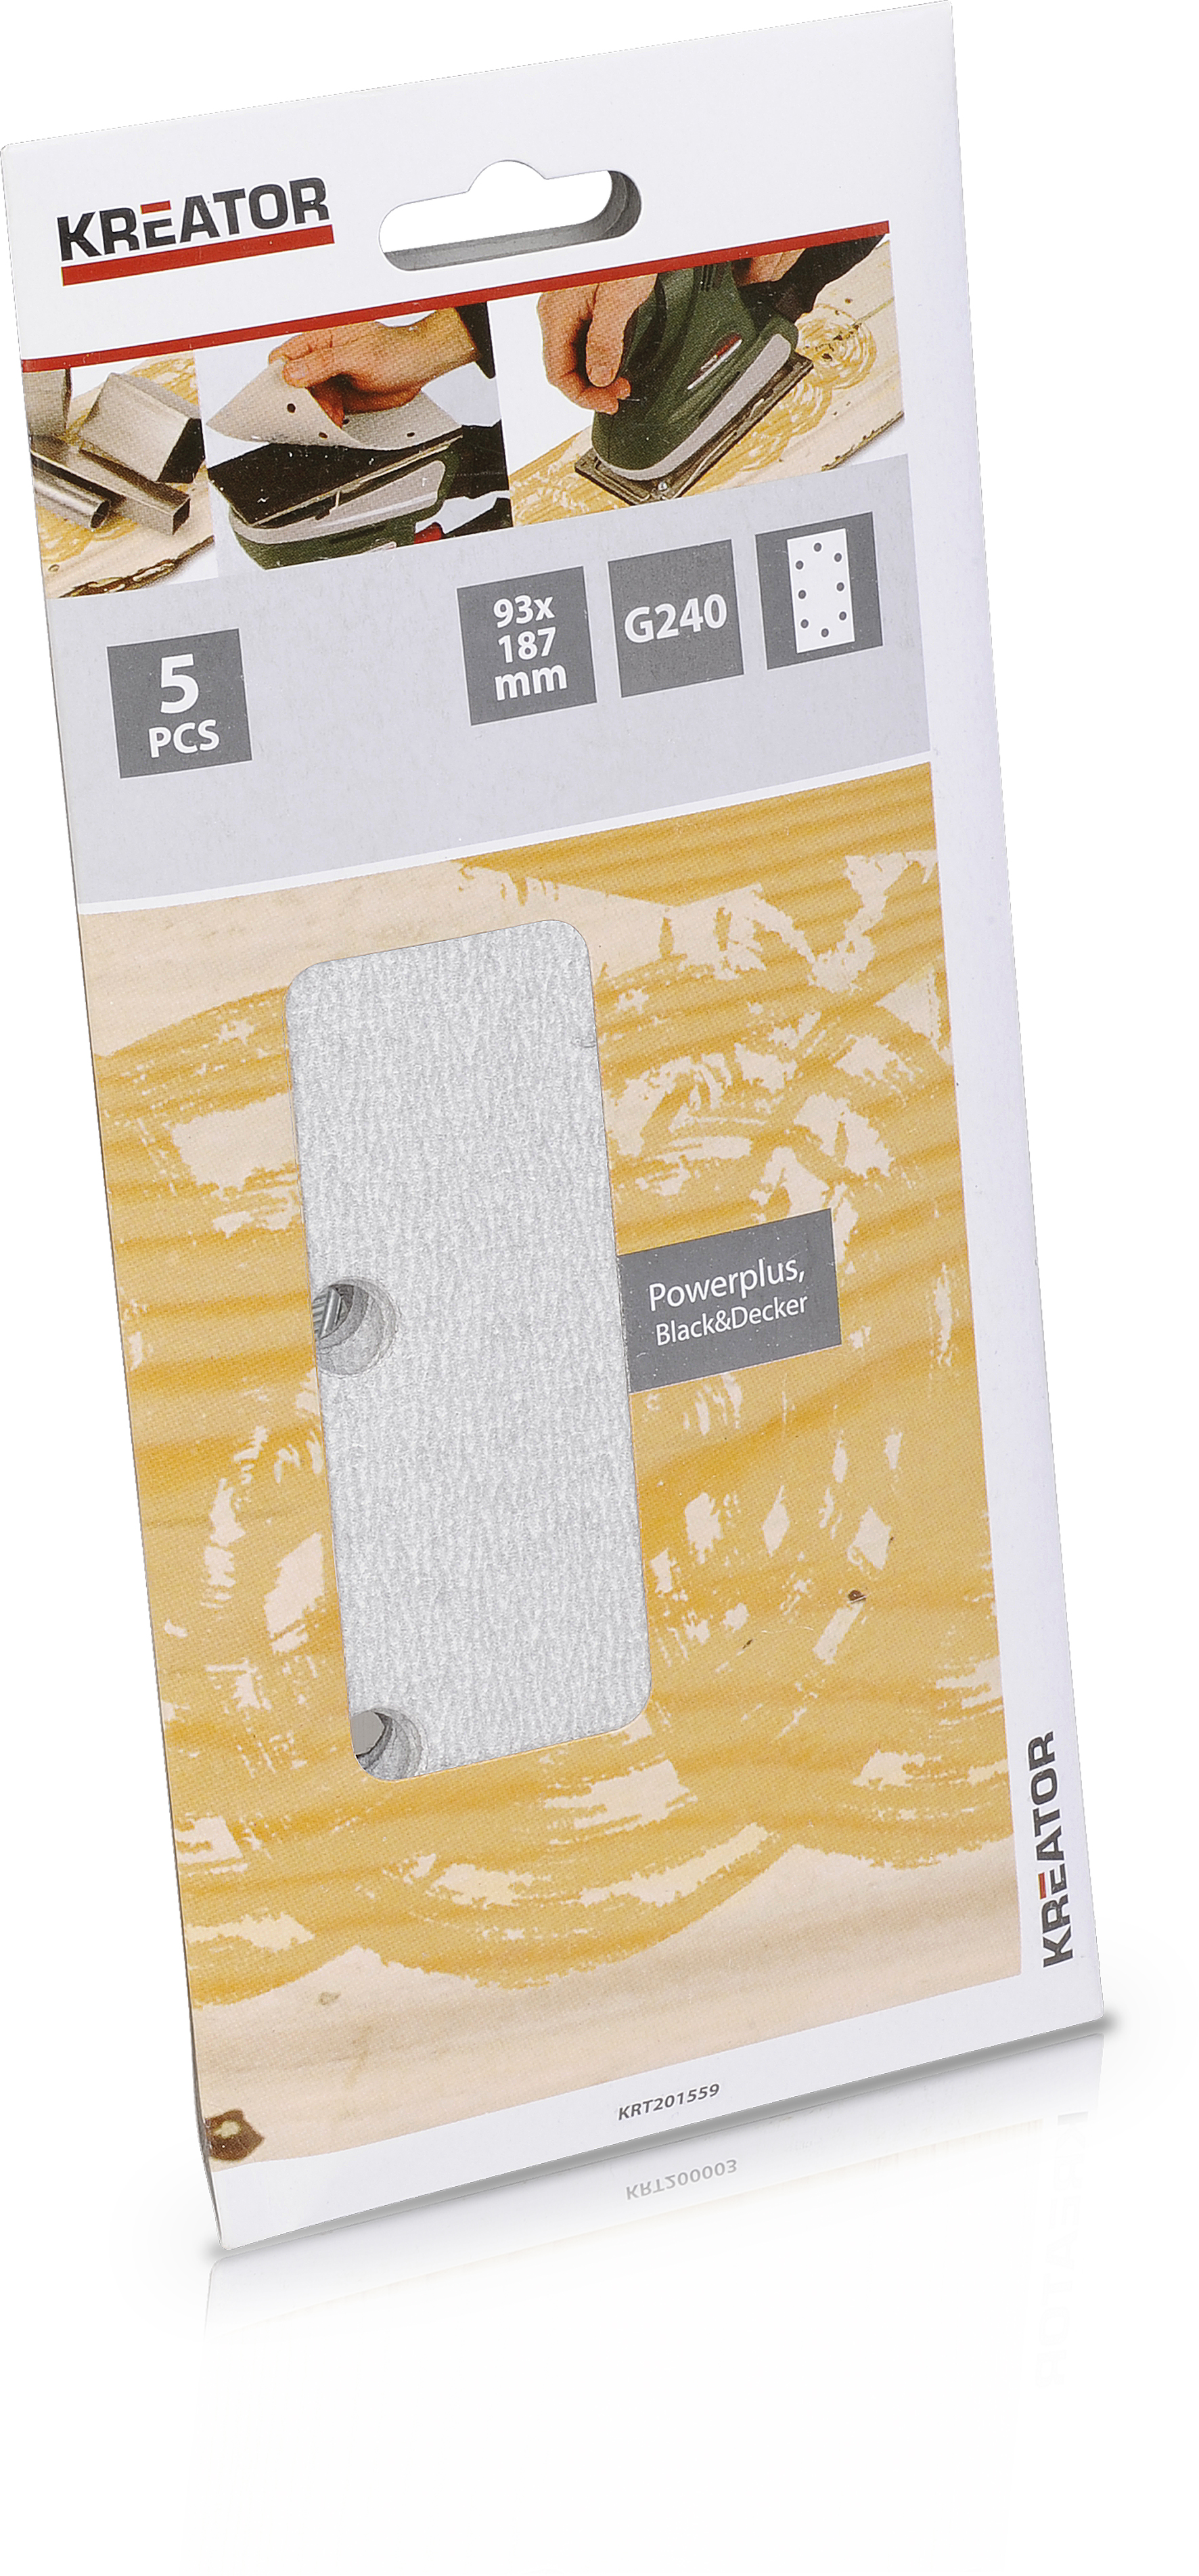 Kreator 5x Rystepudserpapir 93x187 mm